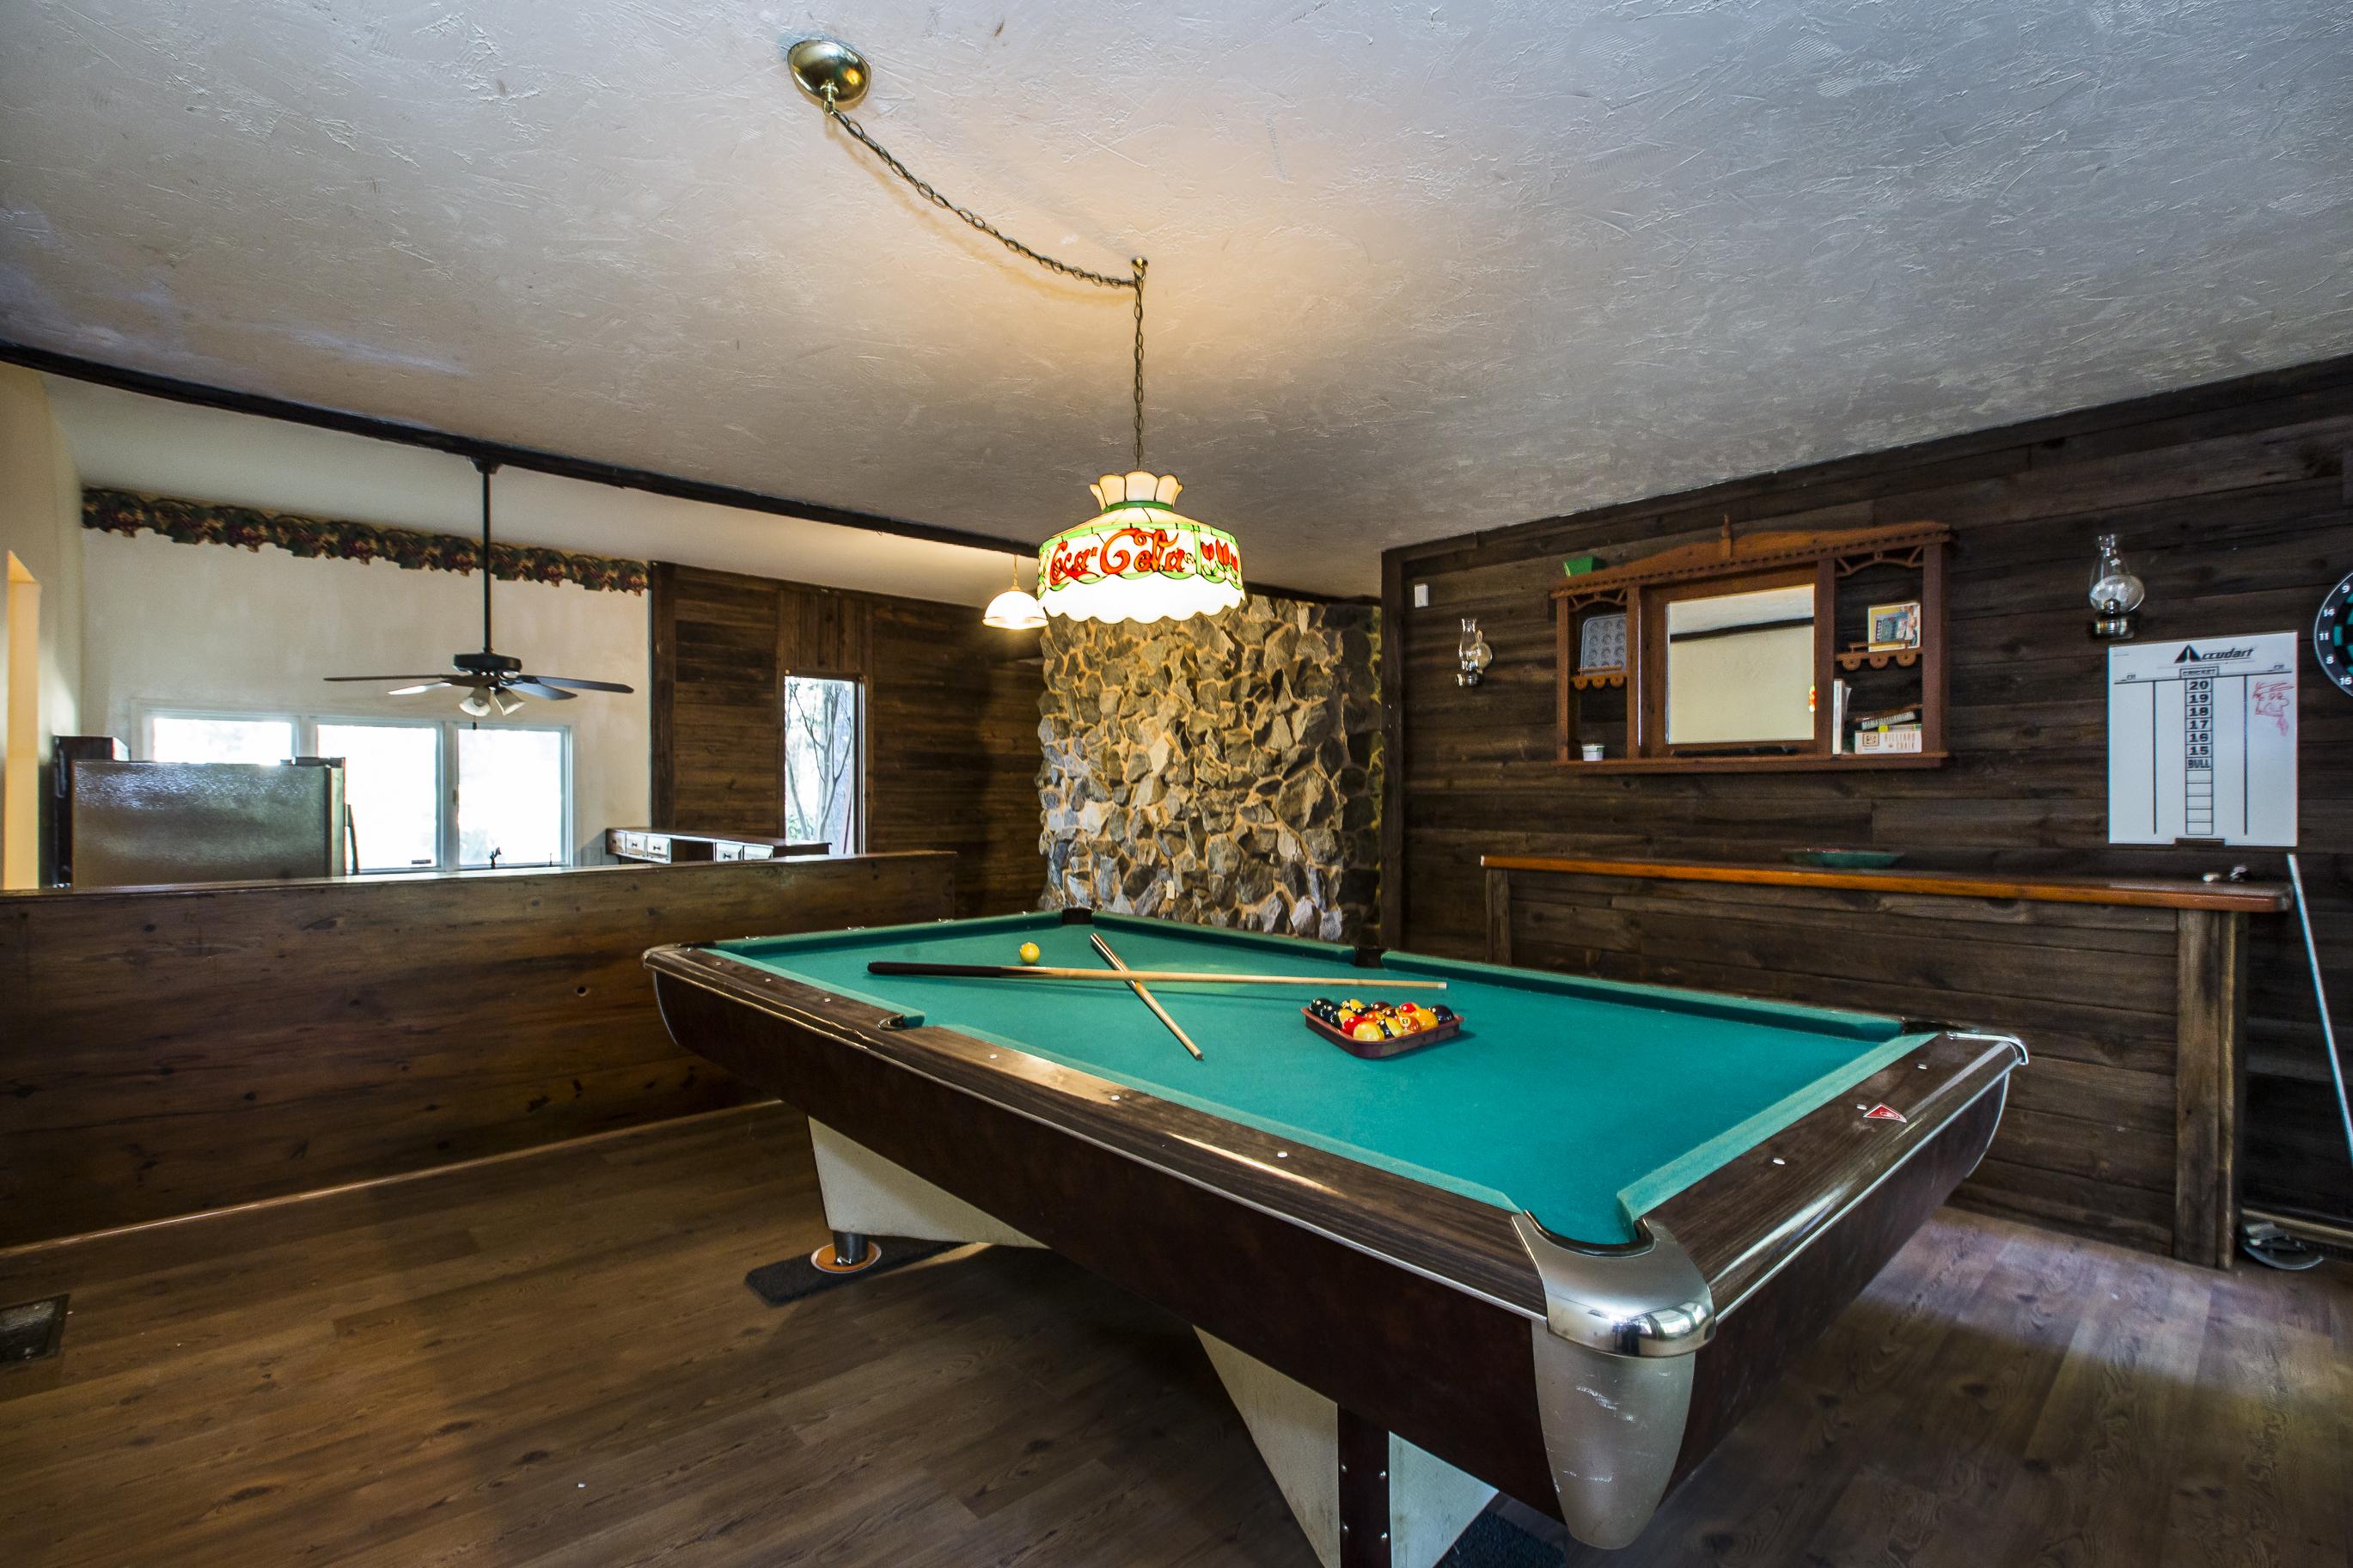 023_Billiards Room